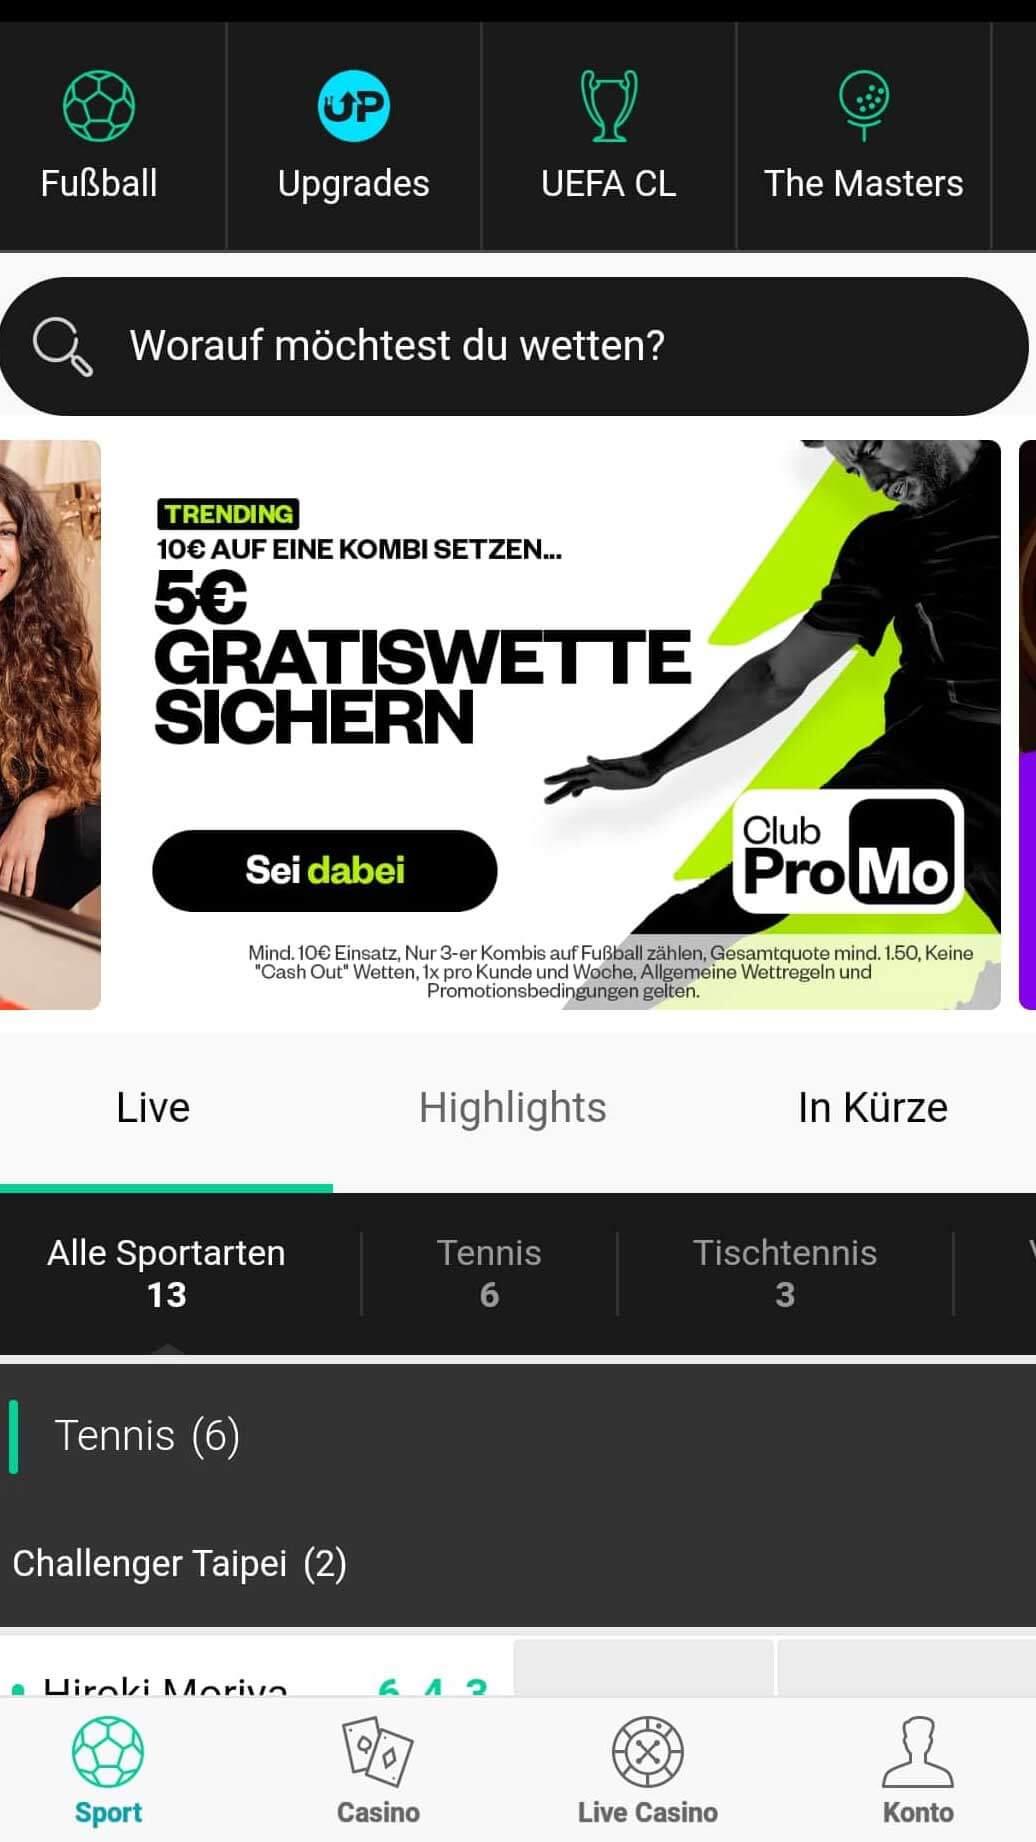 hight resolution of moplay app download f r ios android bewertung 2019 moplay app pferdewetten online